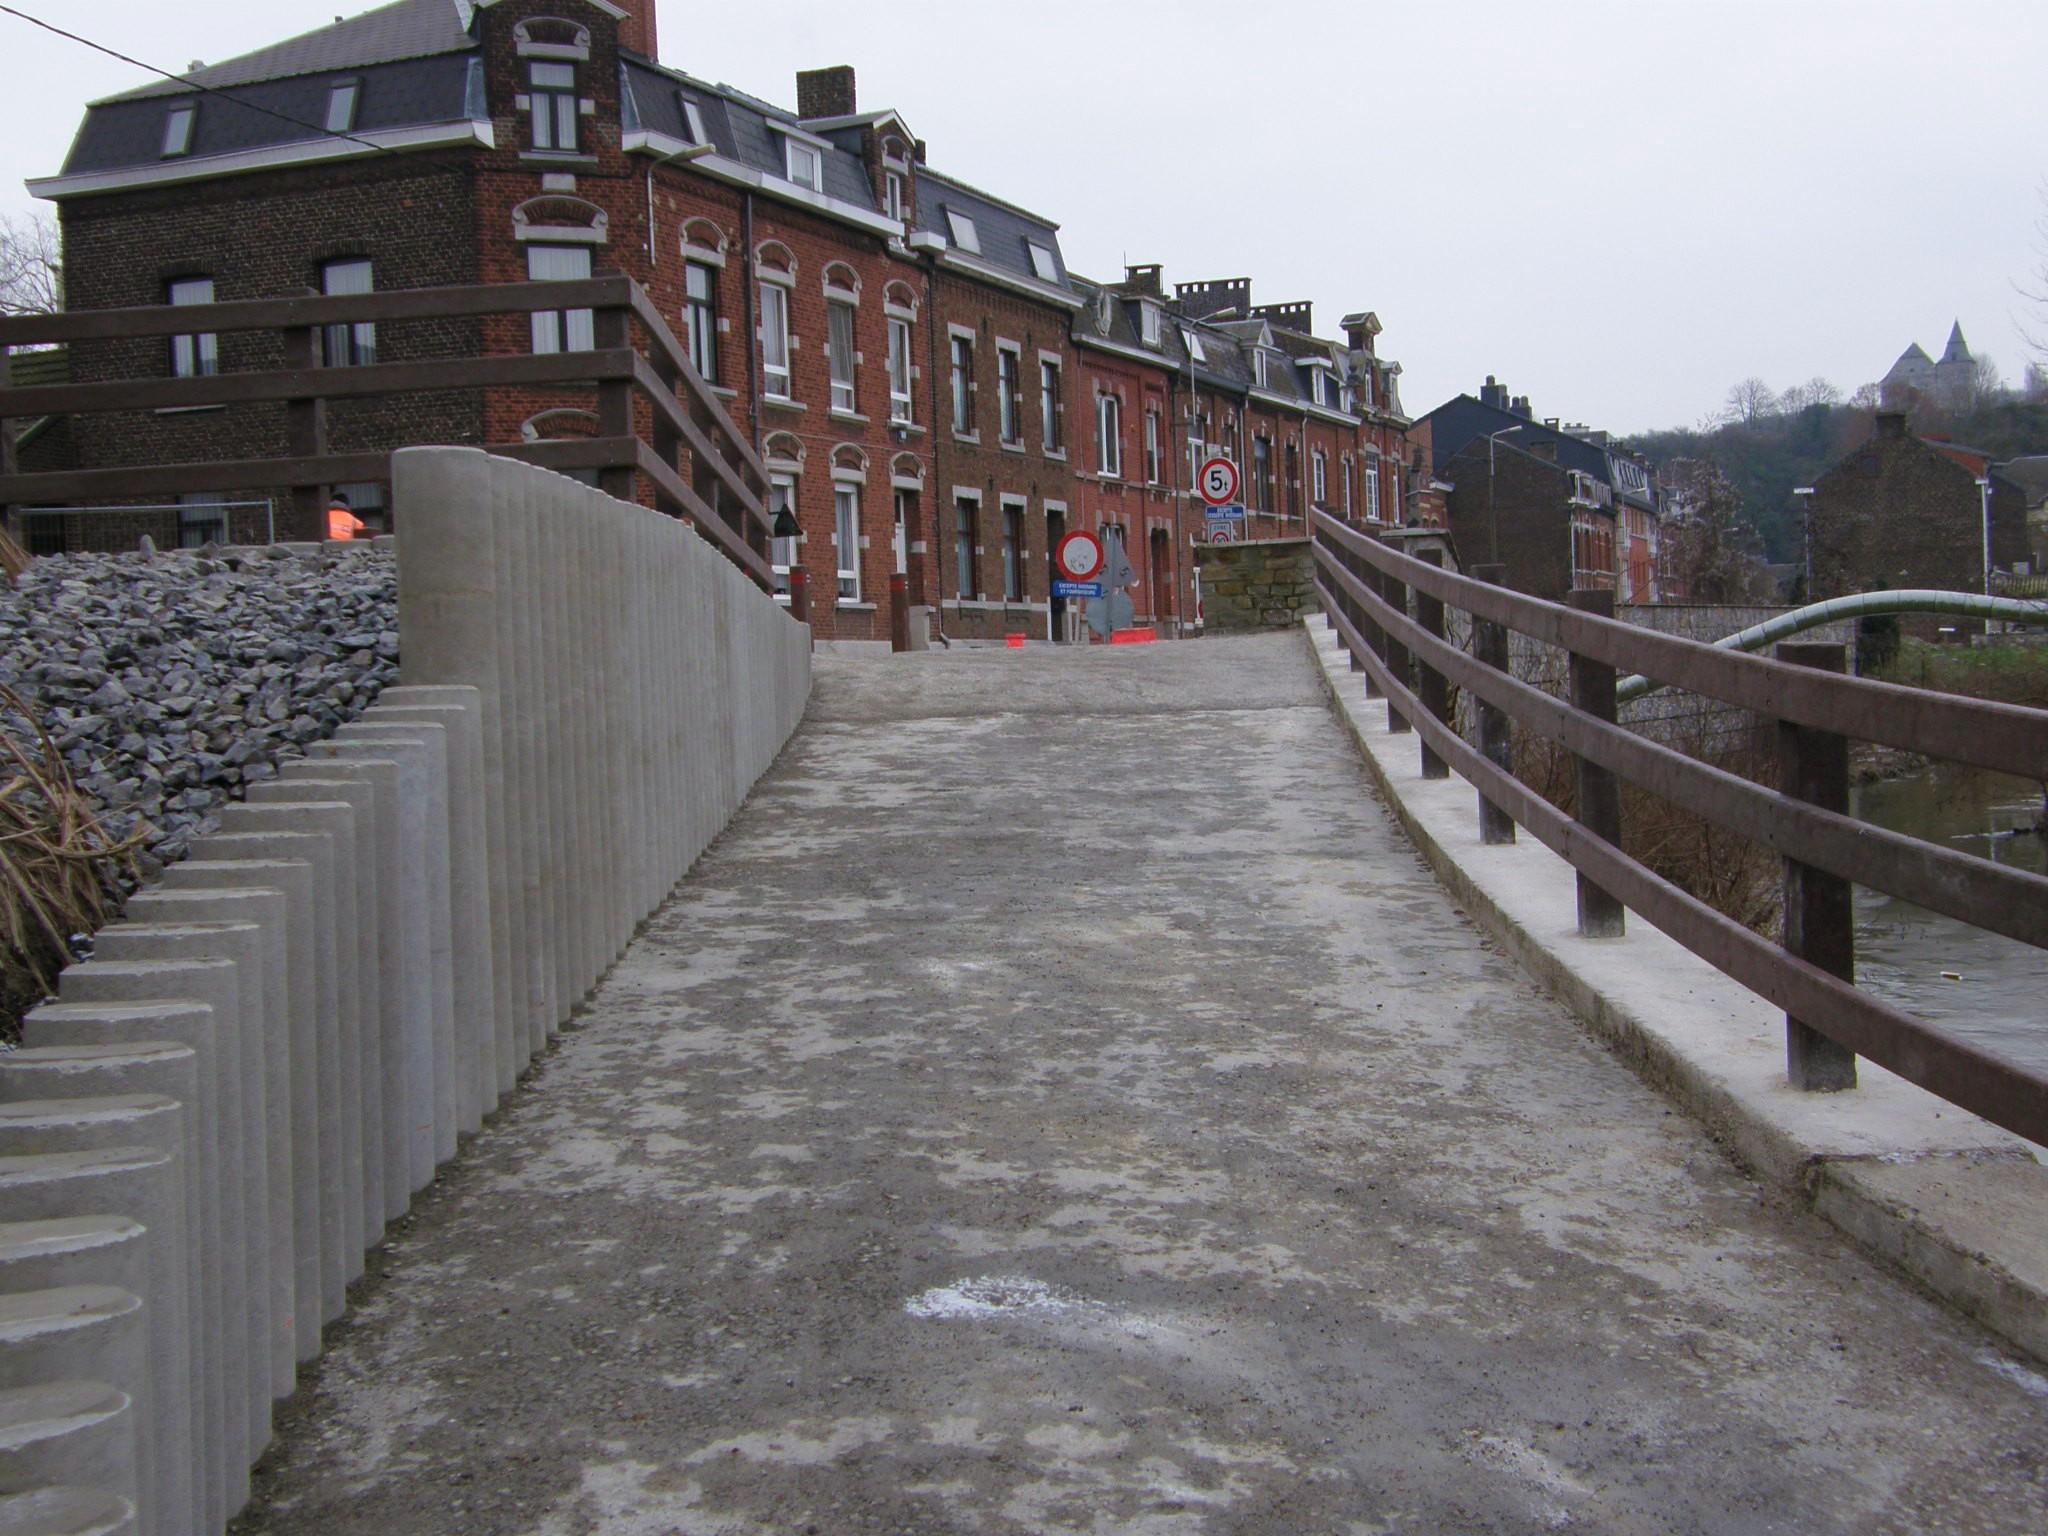 Aménagements urbains